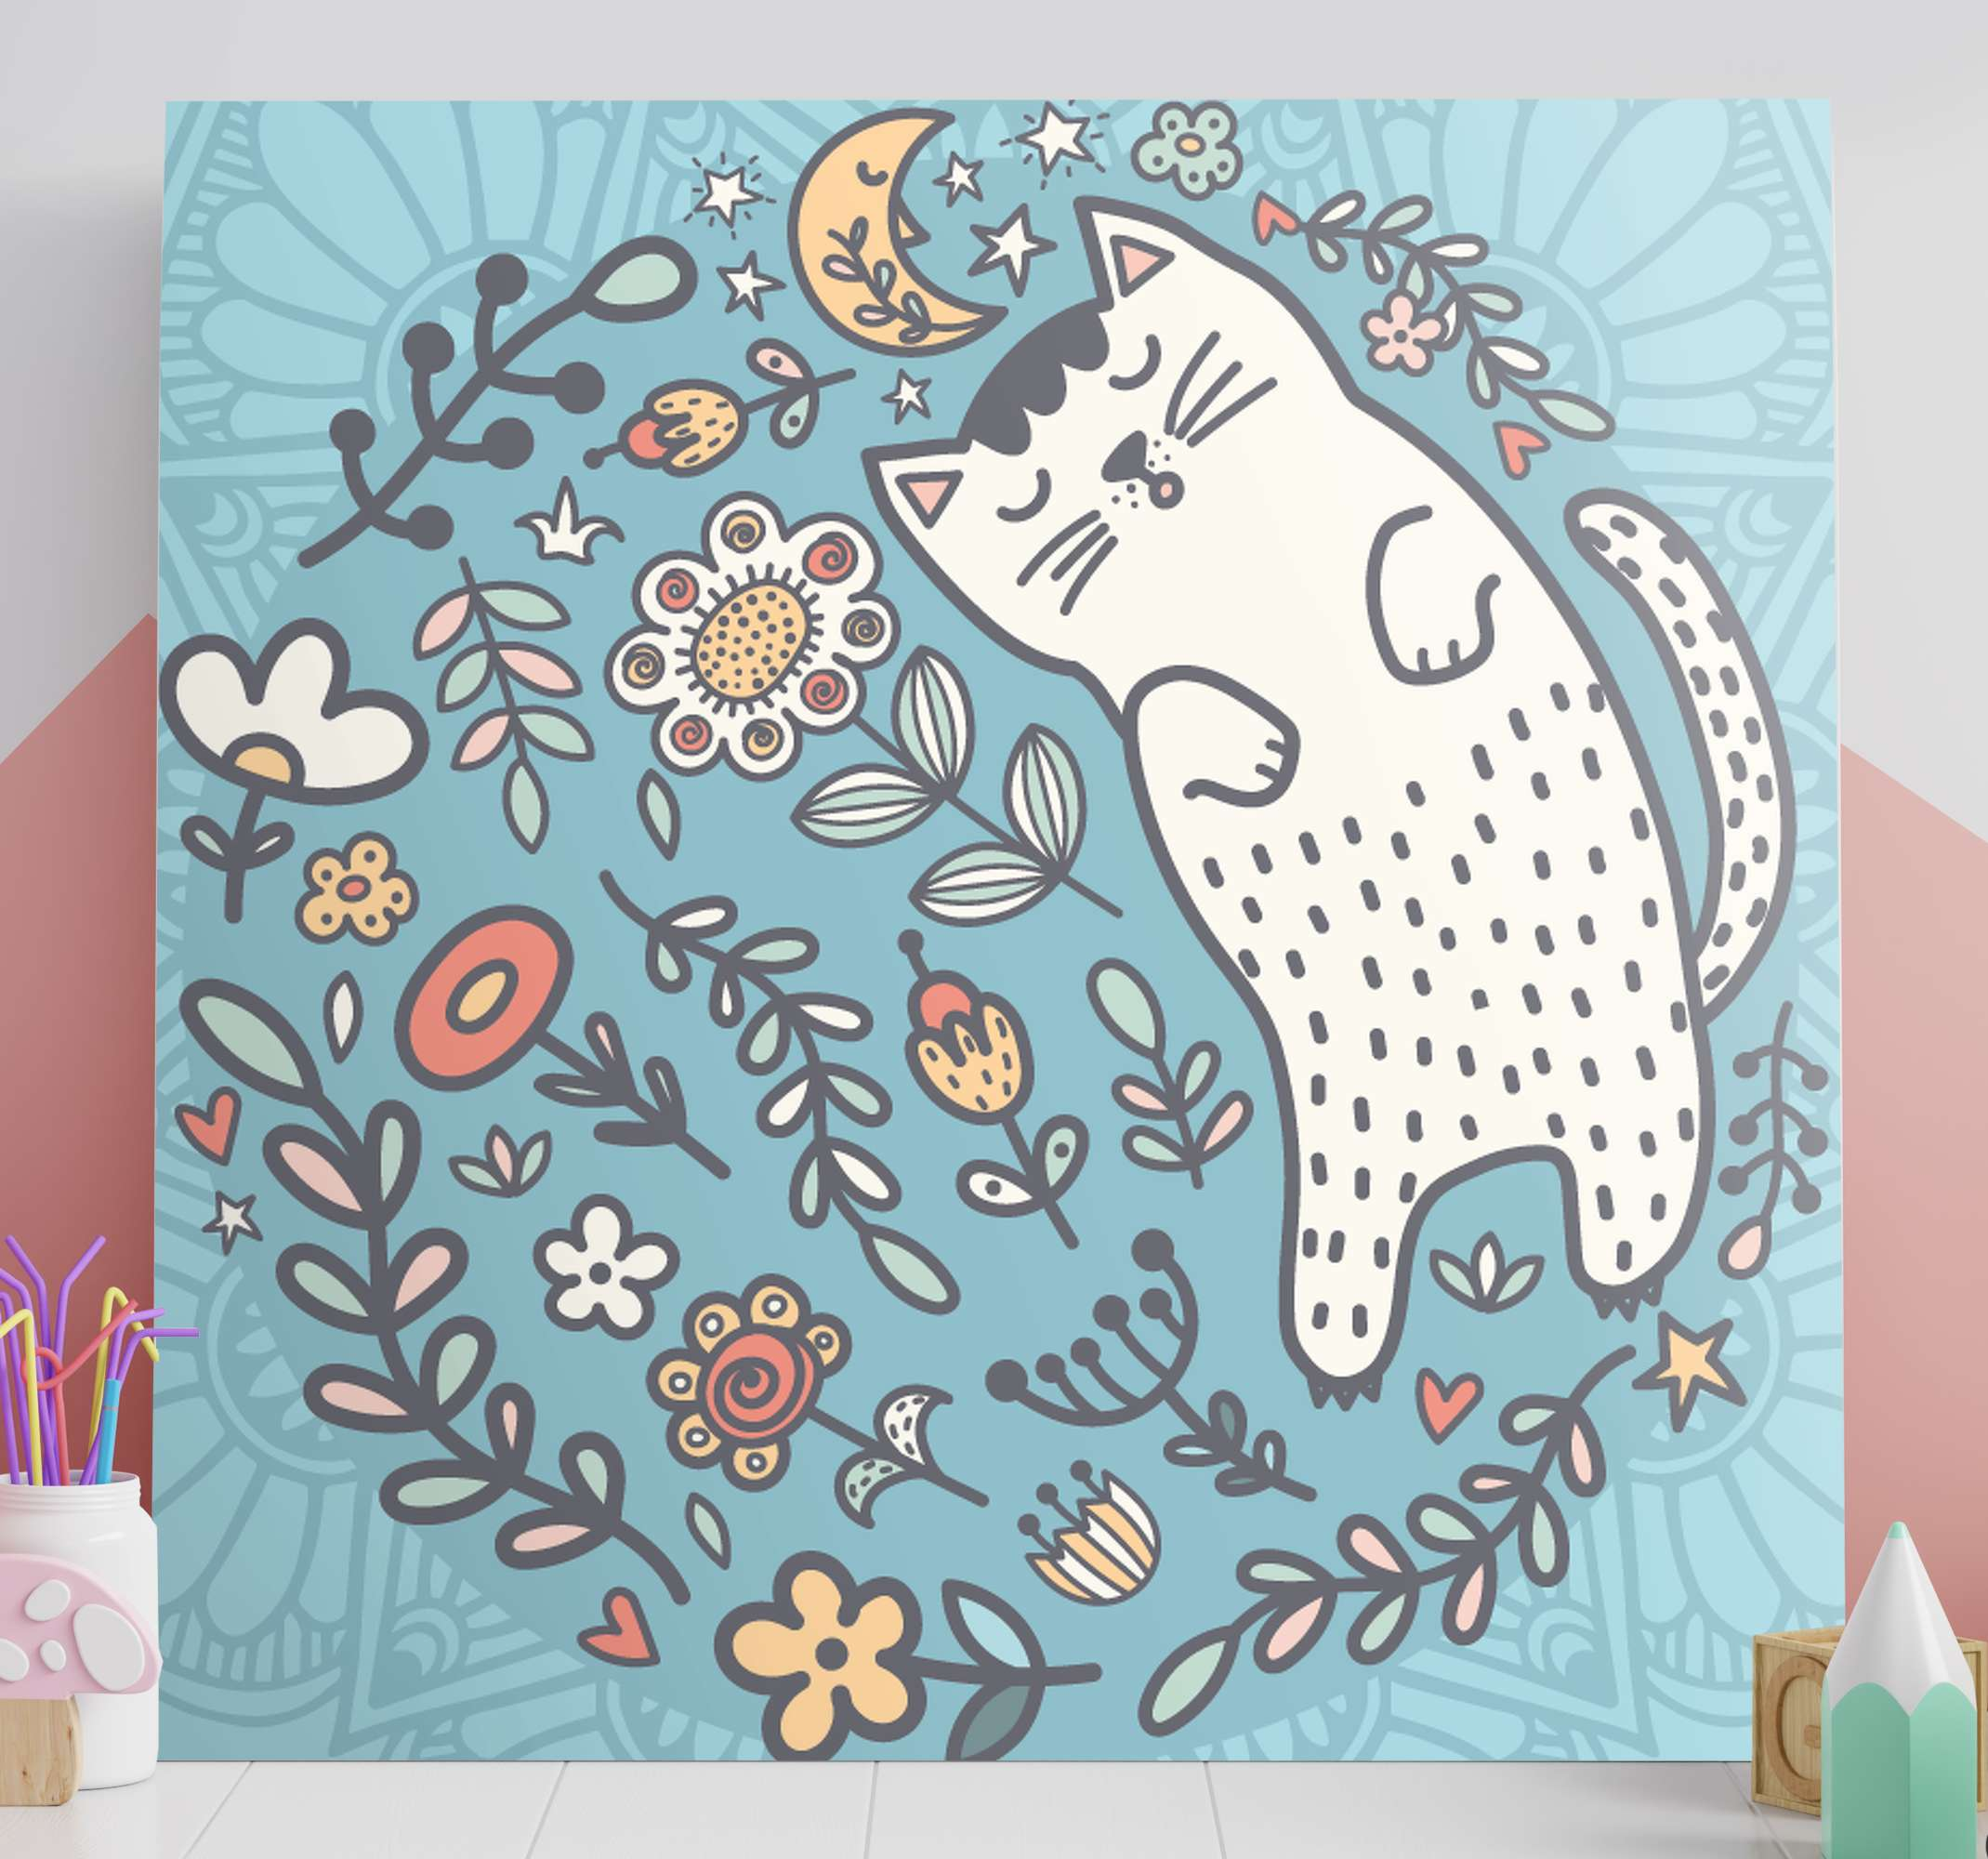 TenStickers. 可爱的猫曼陀罗印花墙艺术. 苗圃帆布印花,上面有一圈美妙的花朵和叶子,还有一只大猫在睡觉。全球交付。